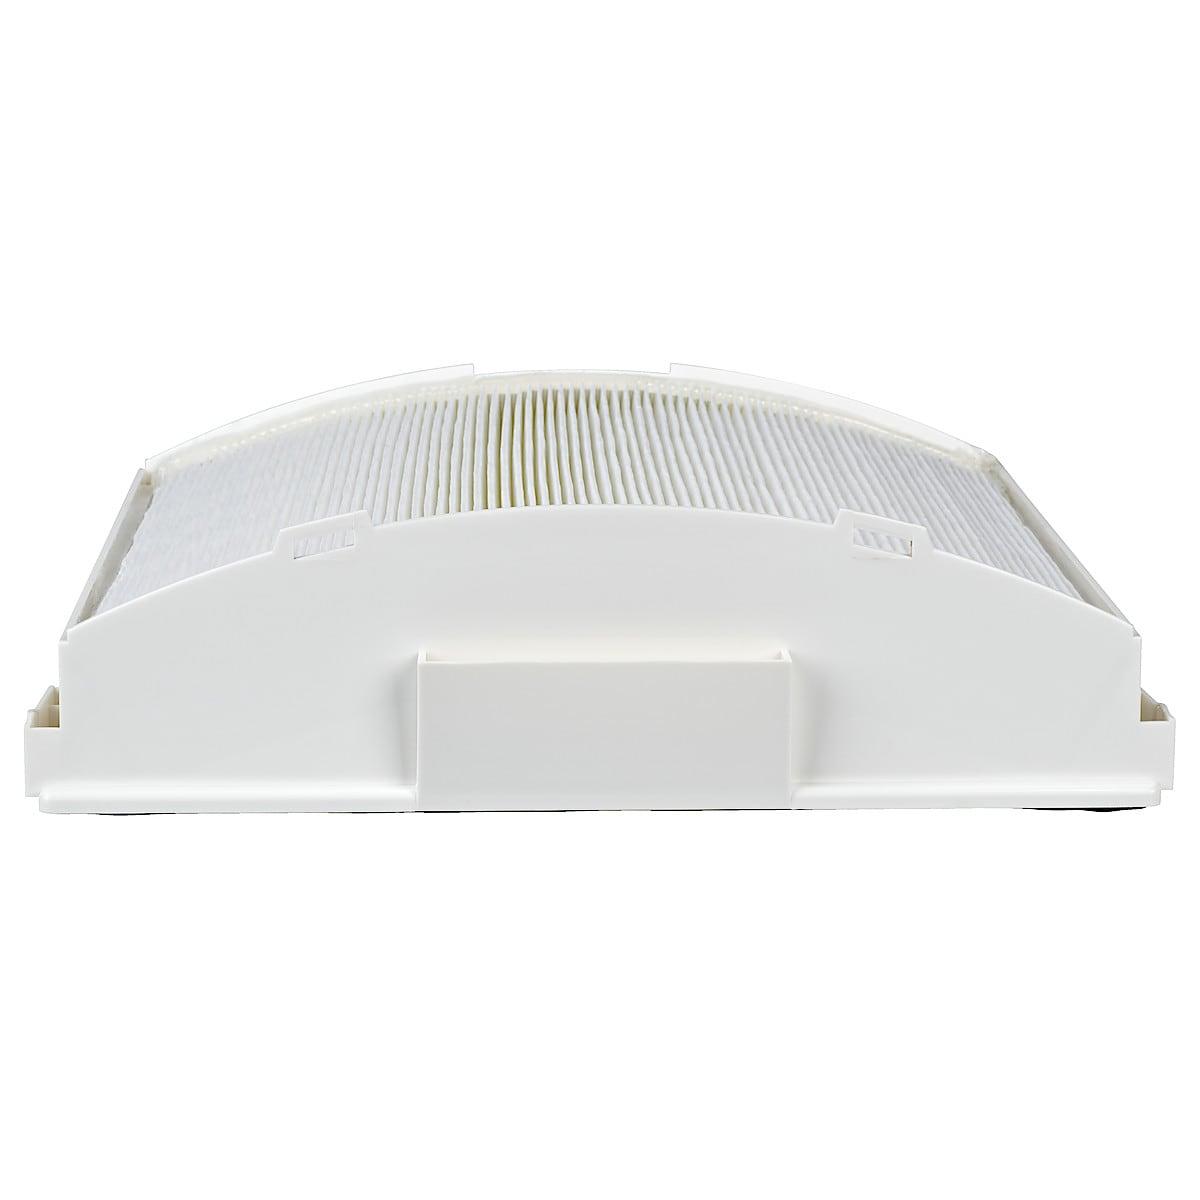 HEPA-filter HF075